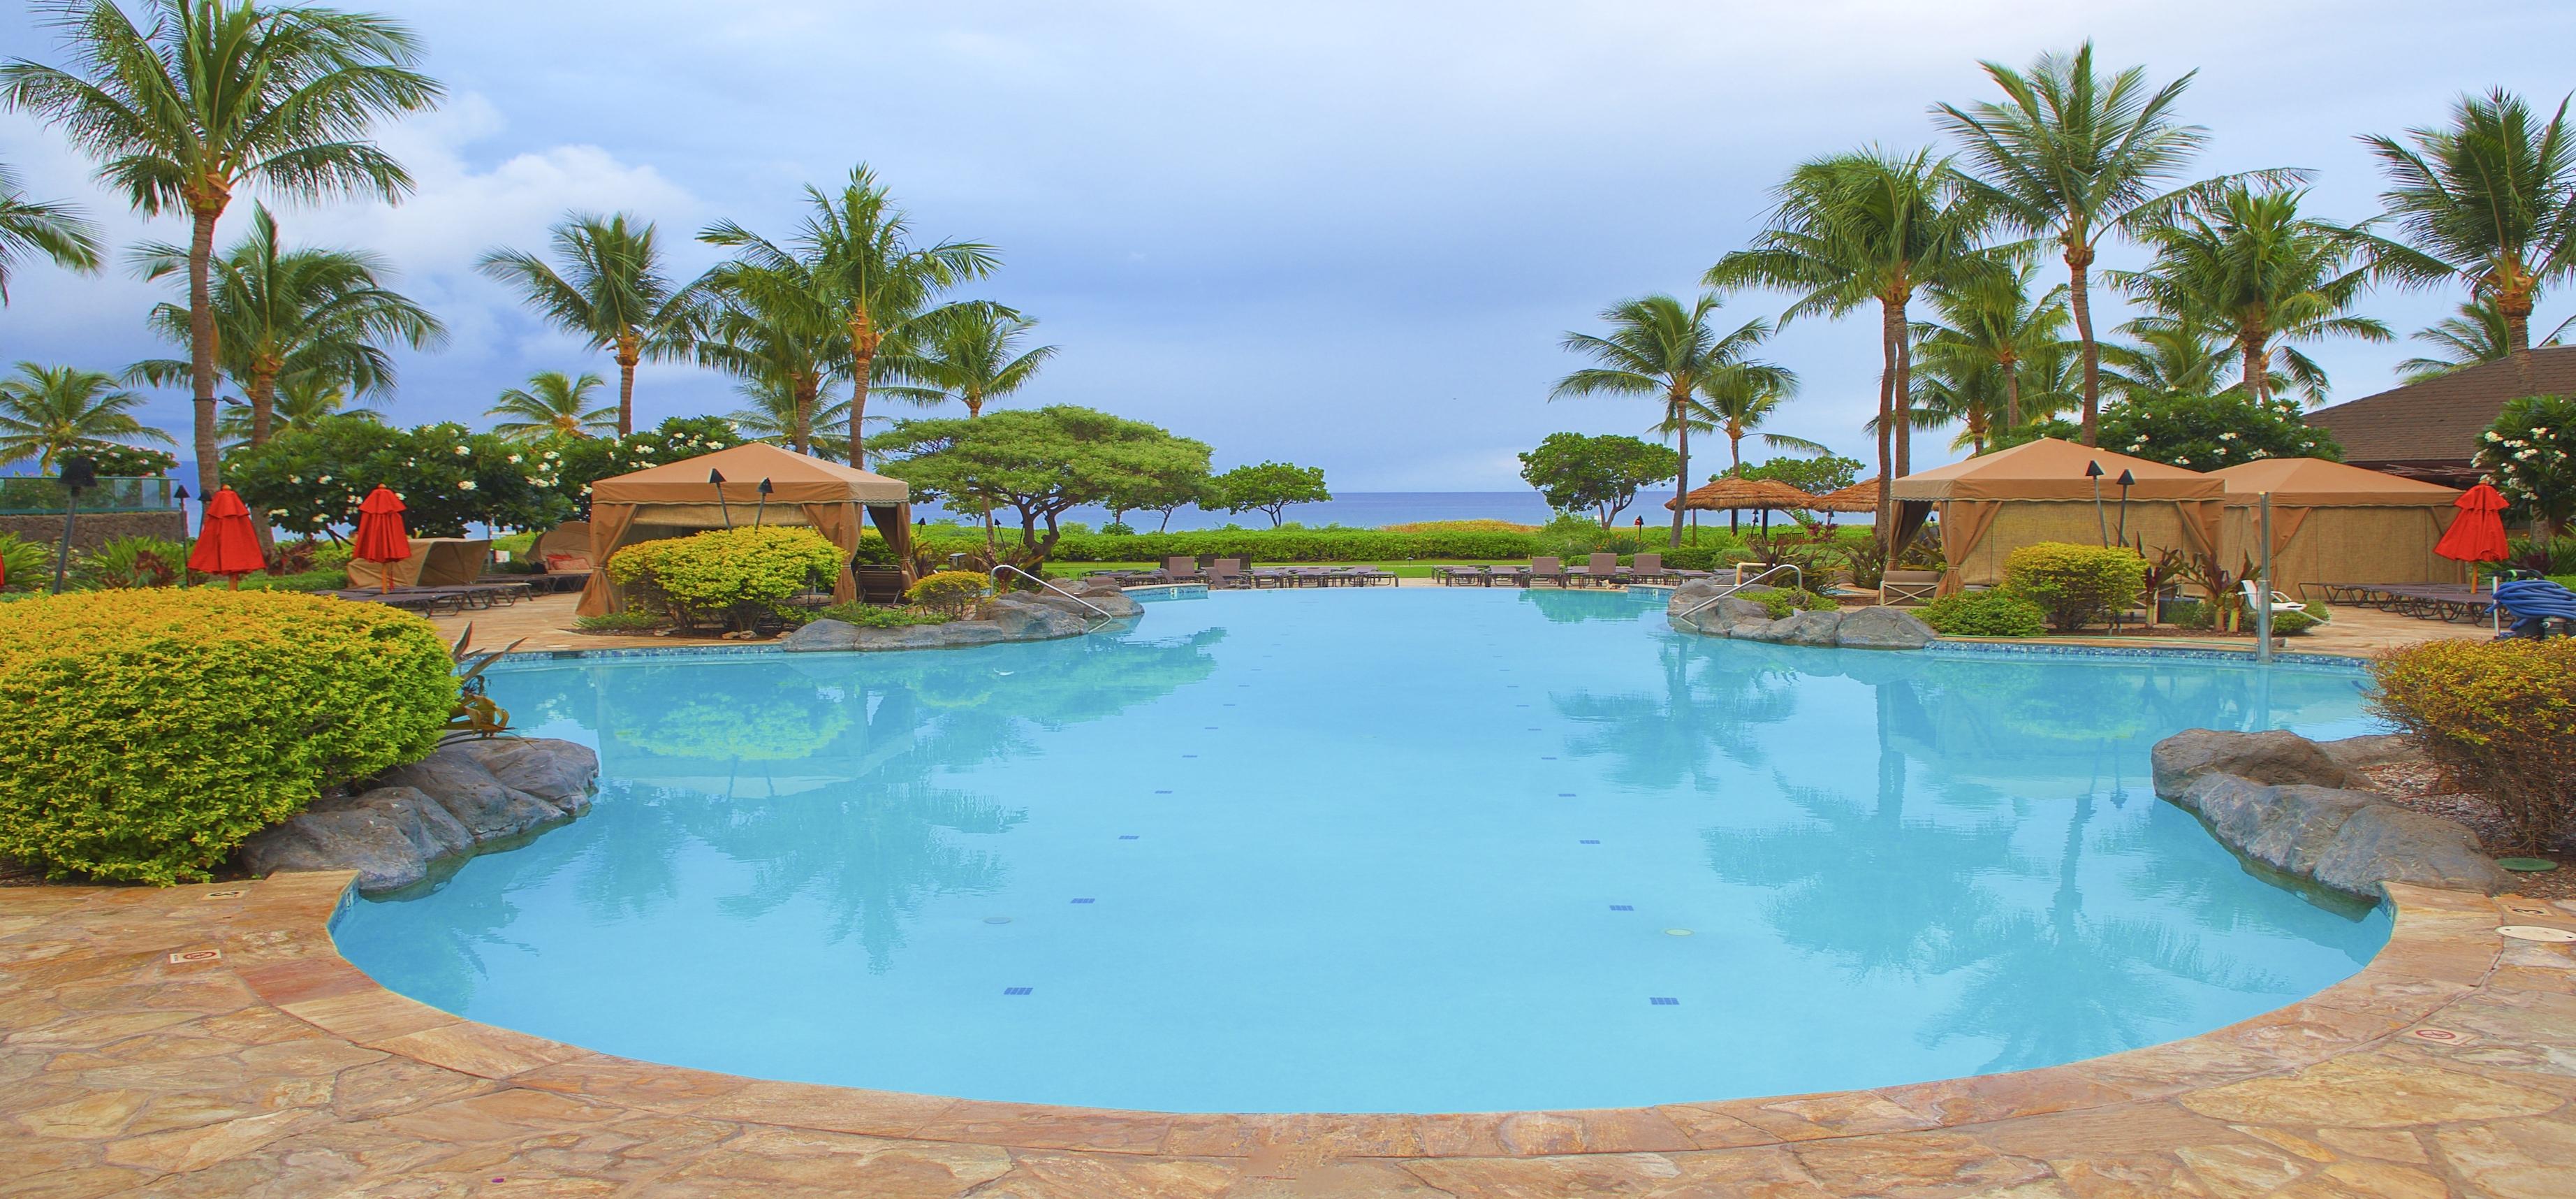 Kaanapali Beach Rentals - Honua Kai Resort Pool